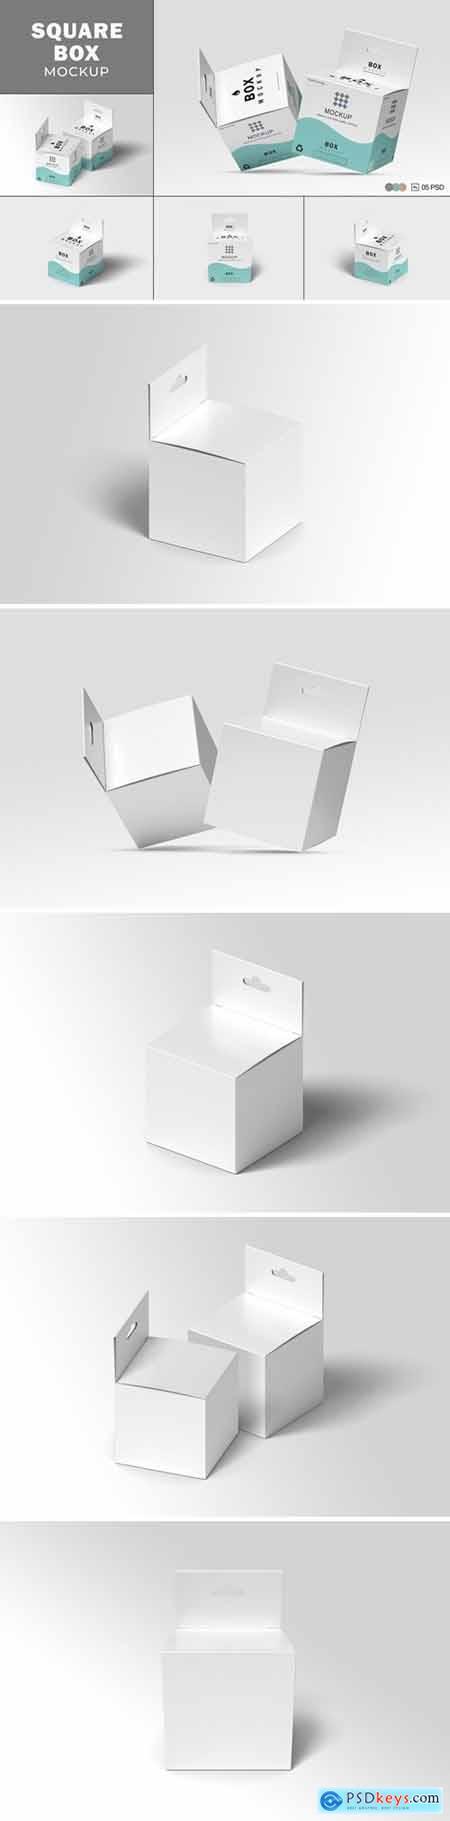 Square Box Mockup Packaging